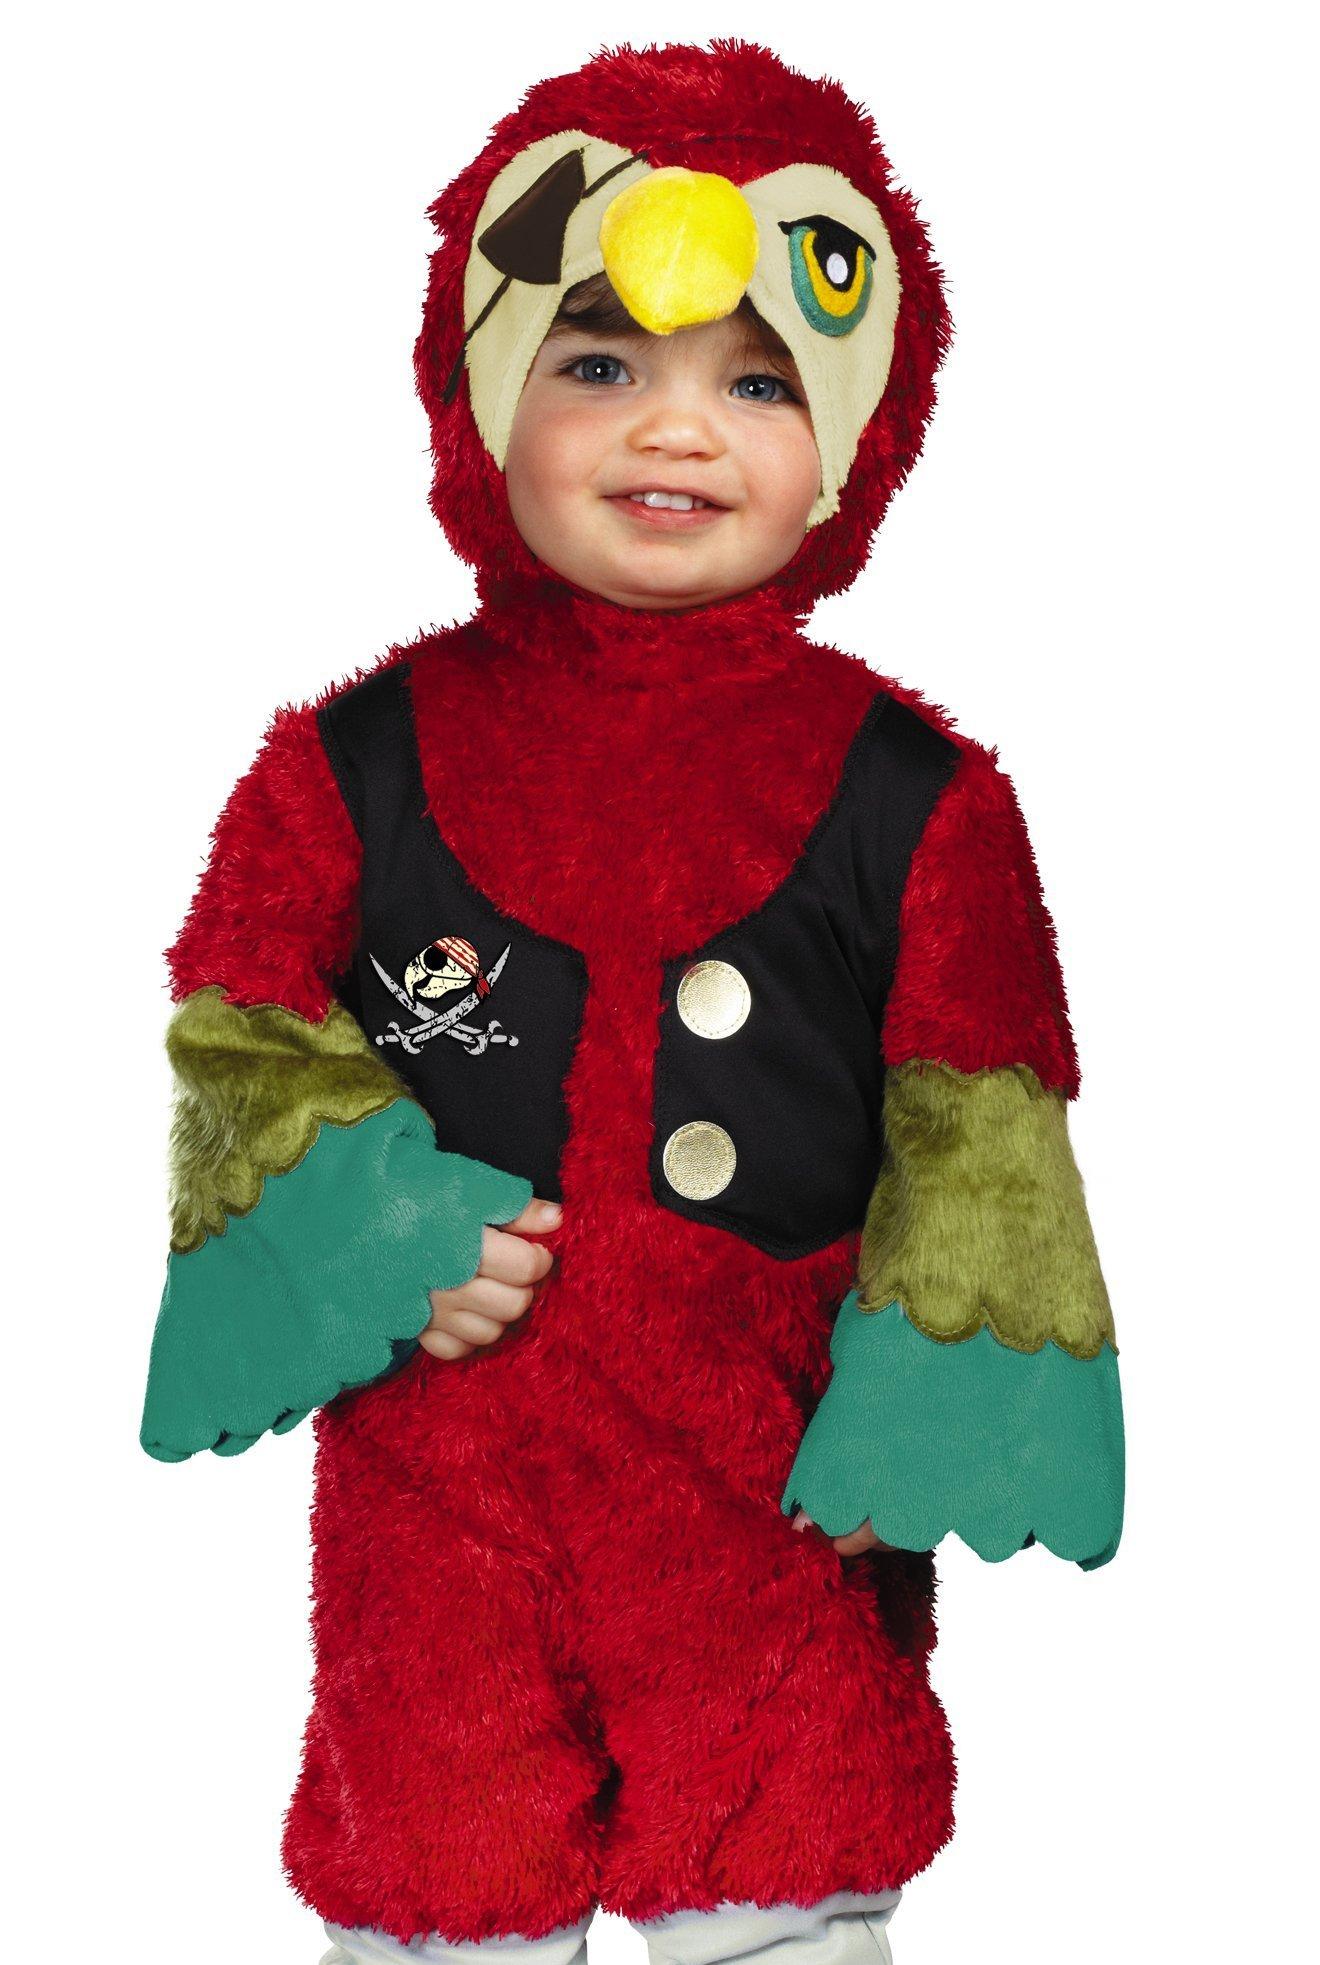 Kids Toddler Baby Pirate Parrot Cute Halloween Costume | eBay